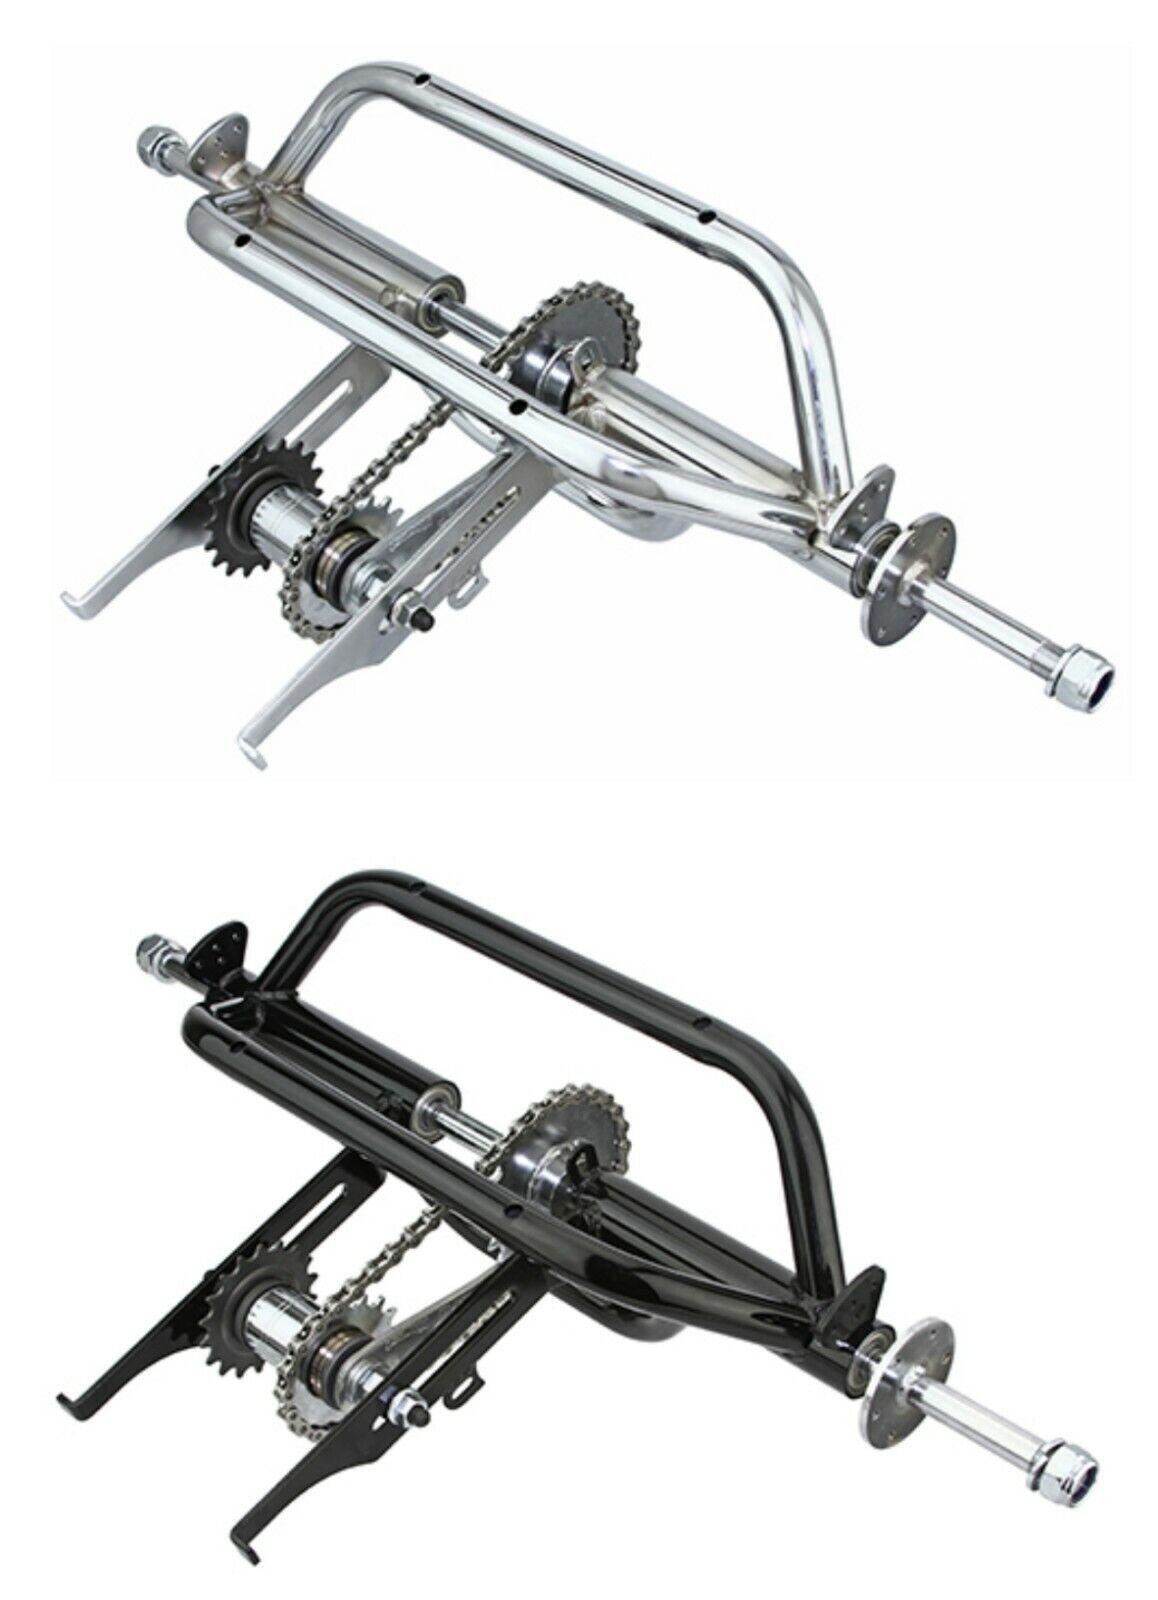 Bike Bike Bike Trike 12-16  Conversion Kit 1 Speed Coaster kids tricycle 7c83c1